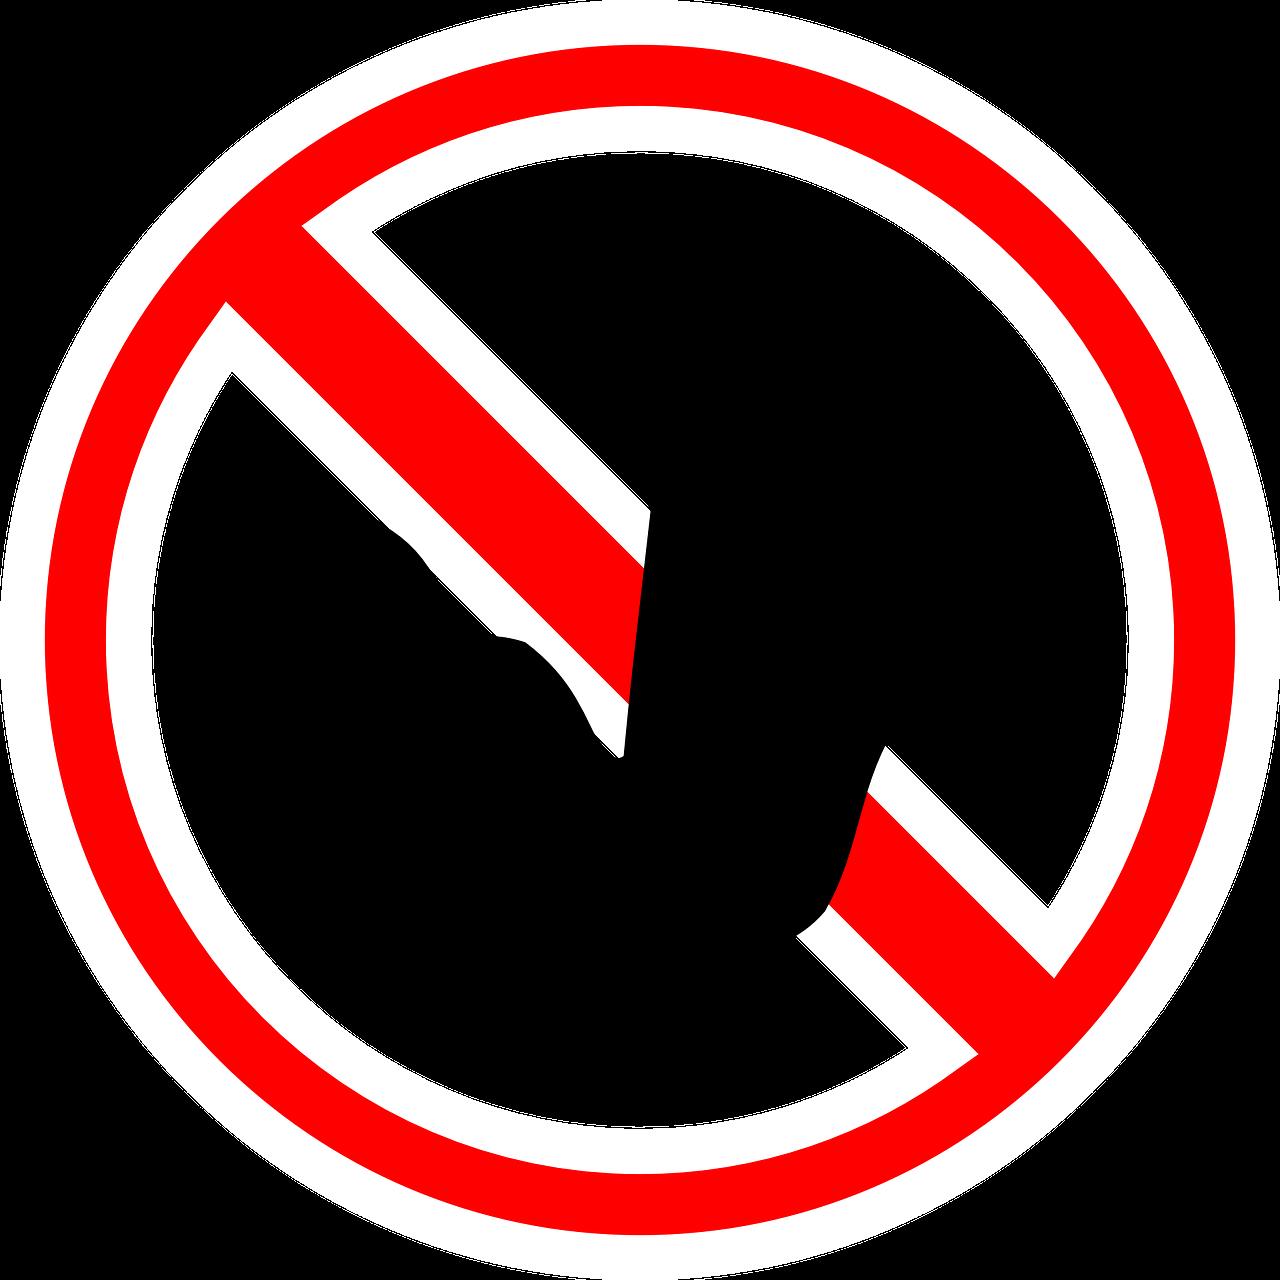 sign, stop, halt